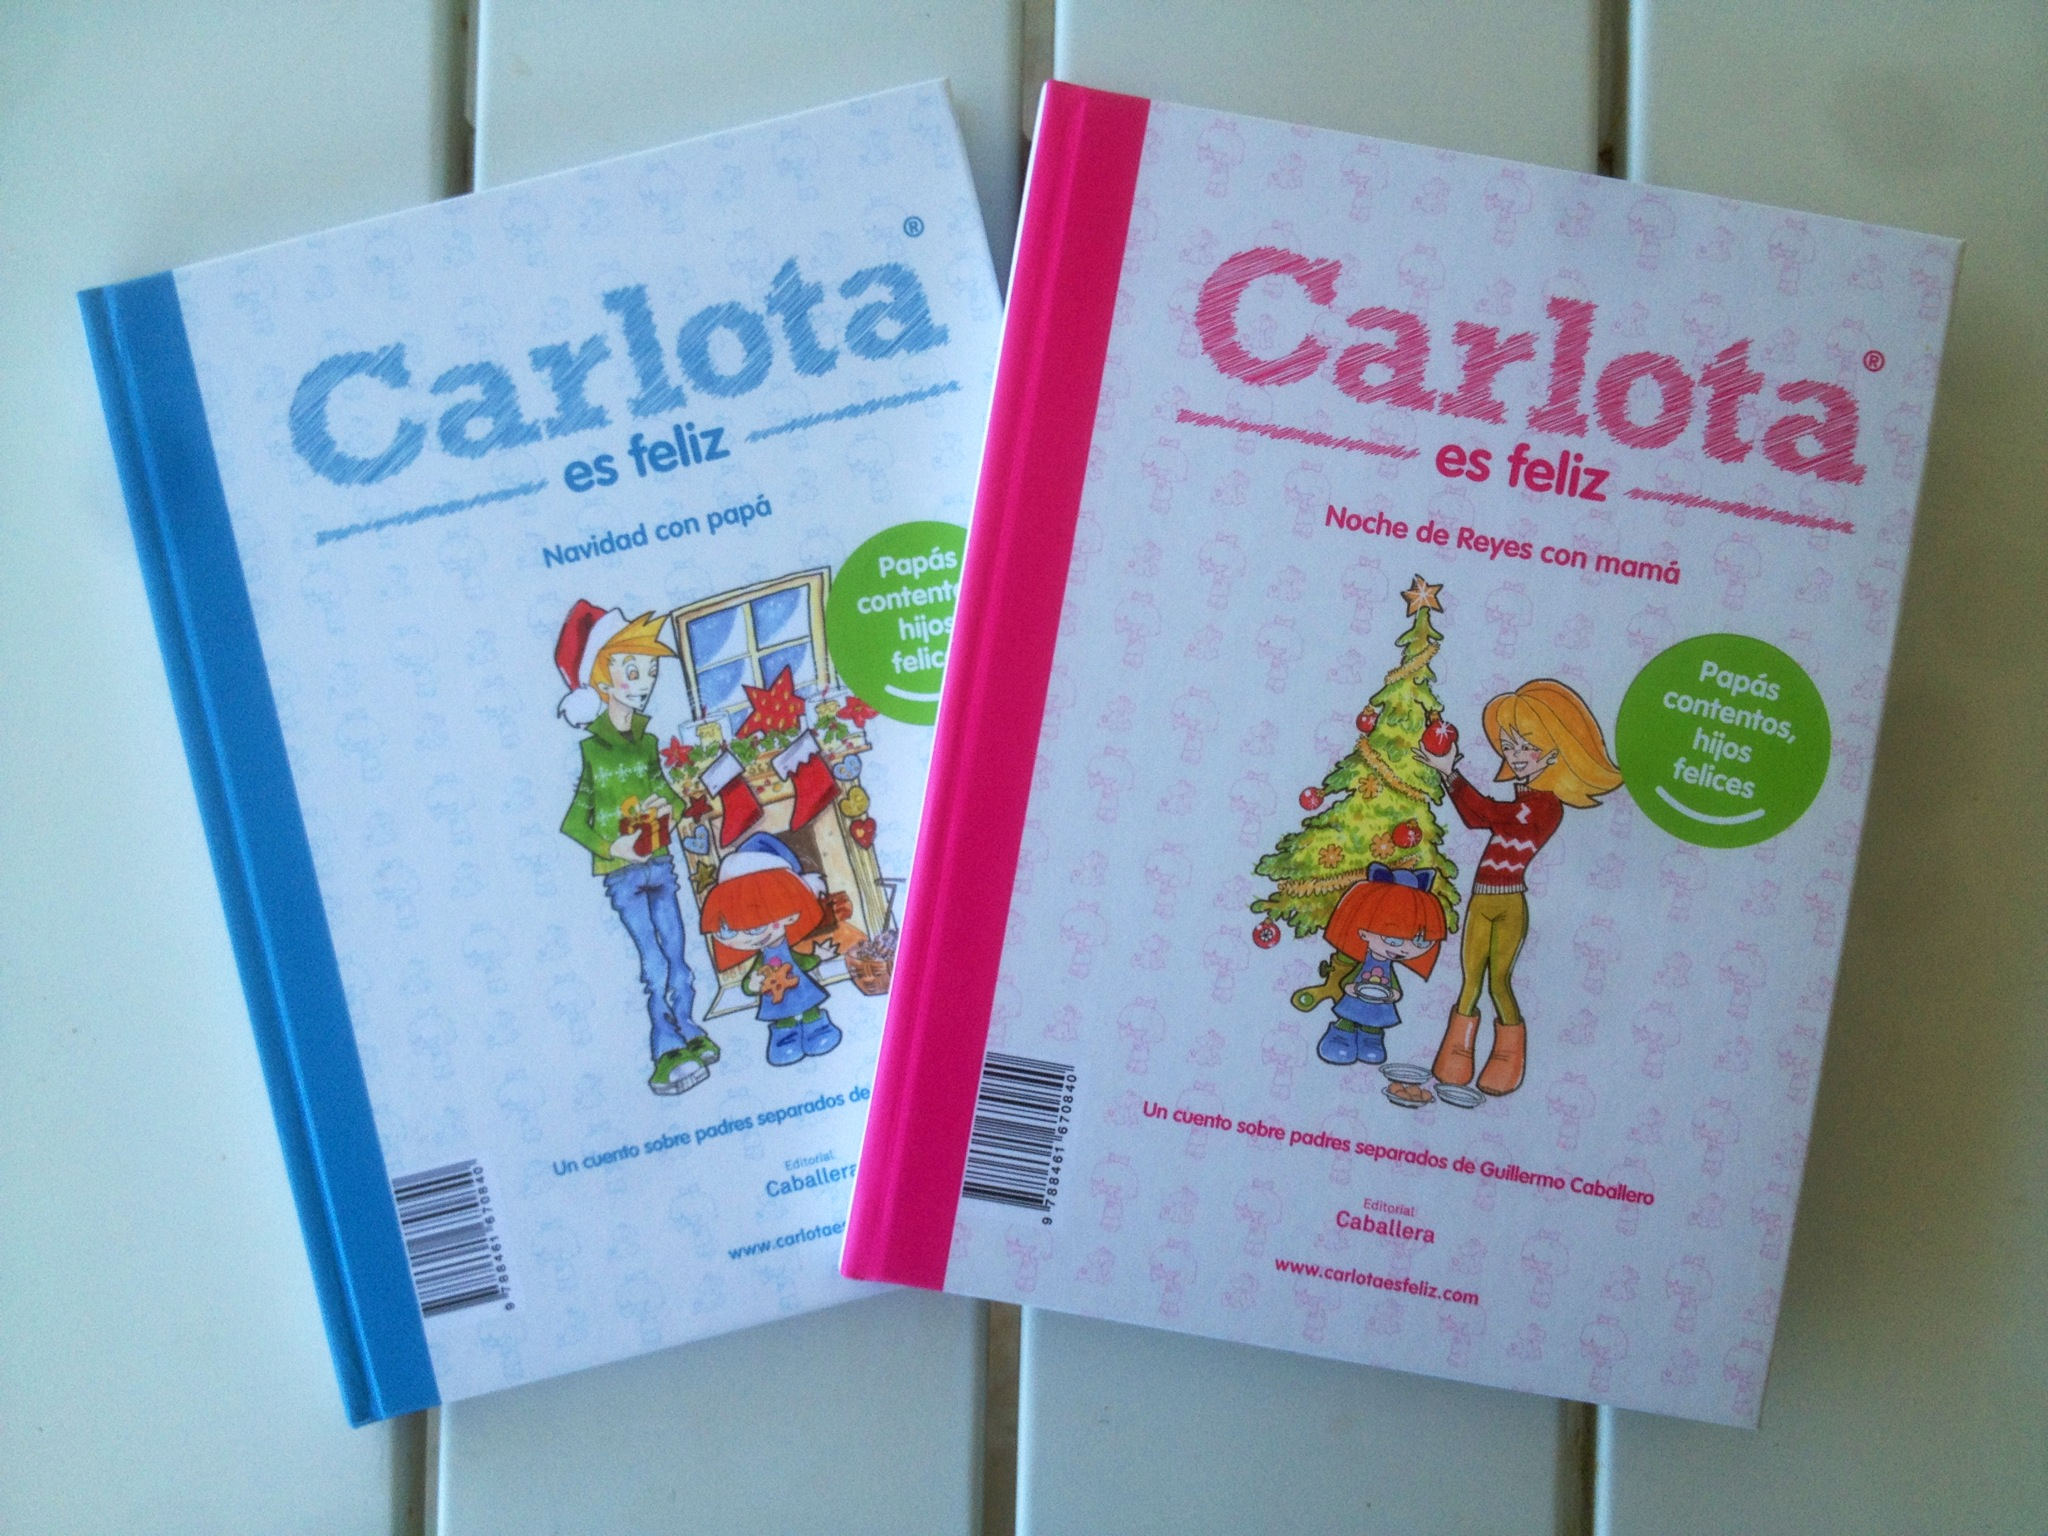 Carlota es Feliz 3